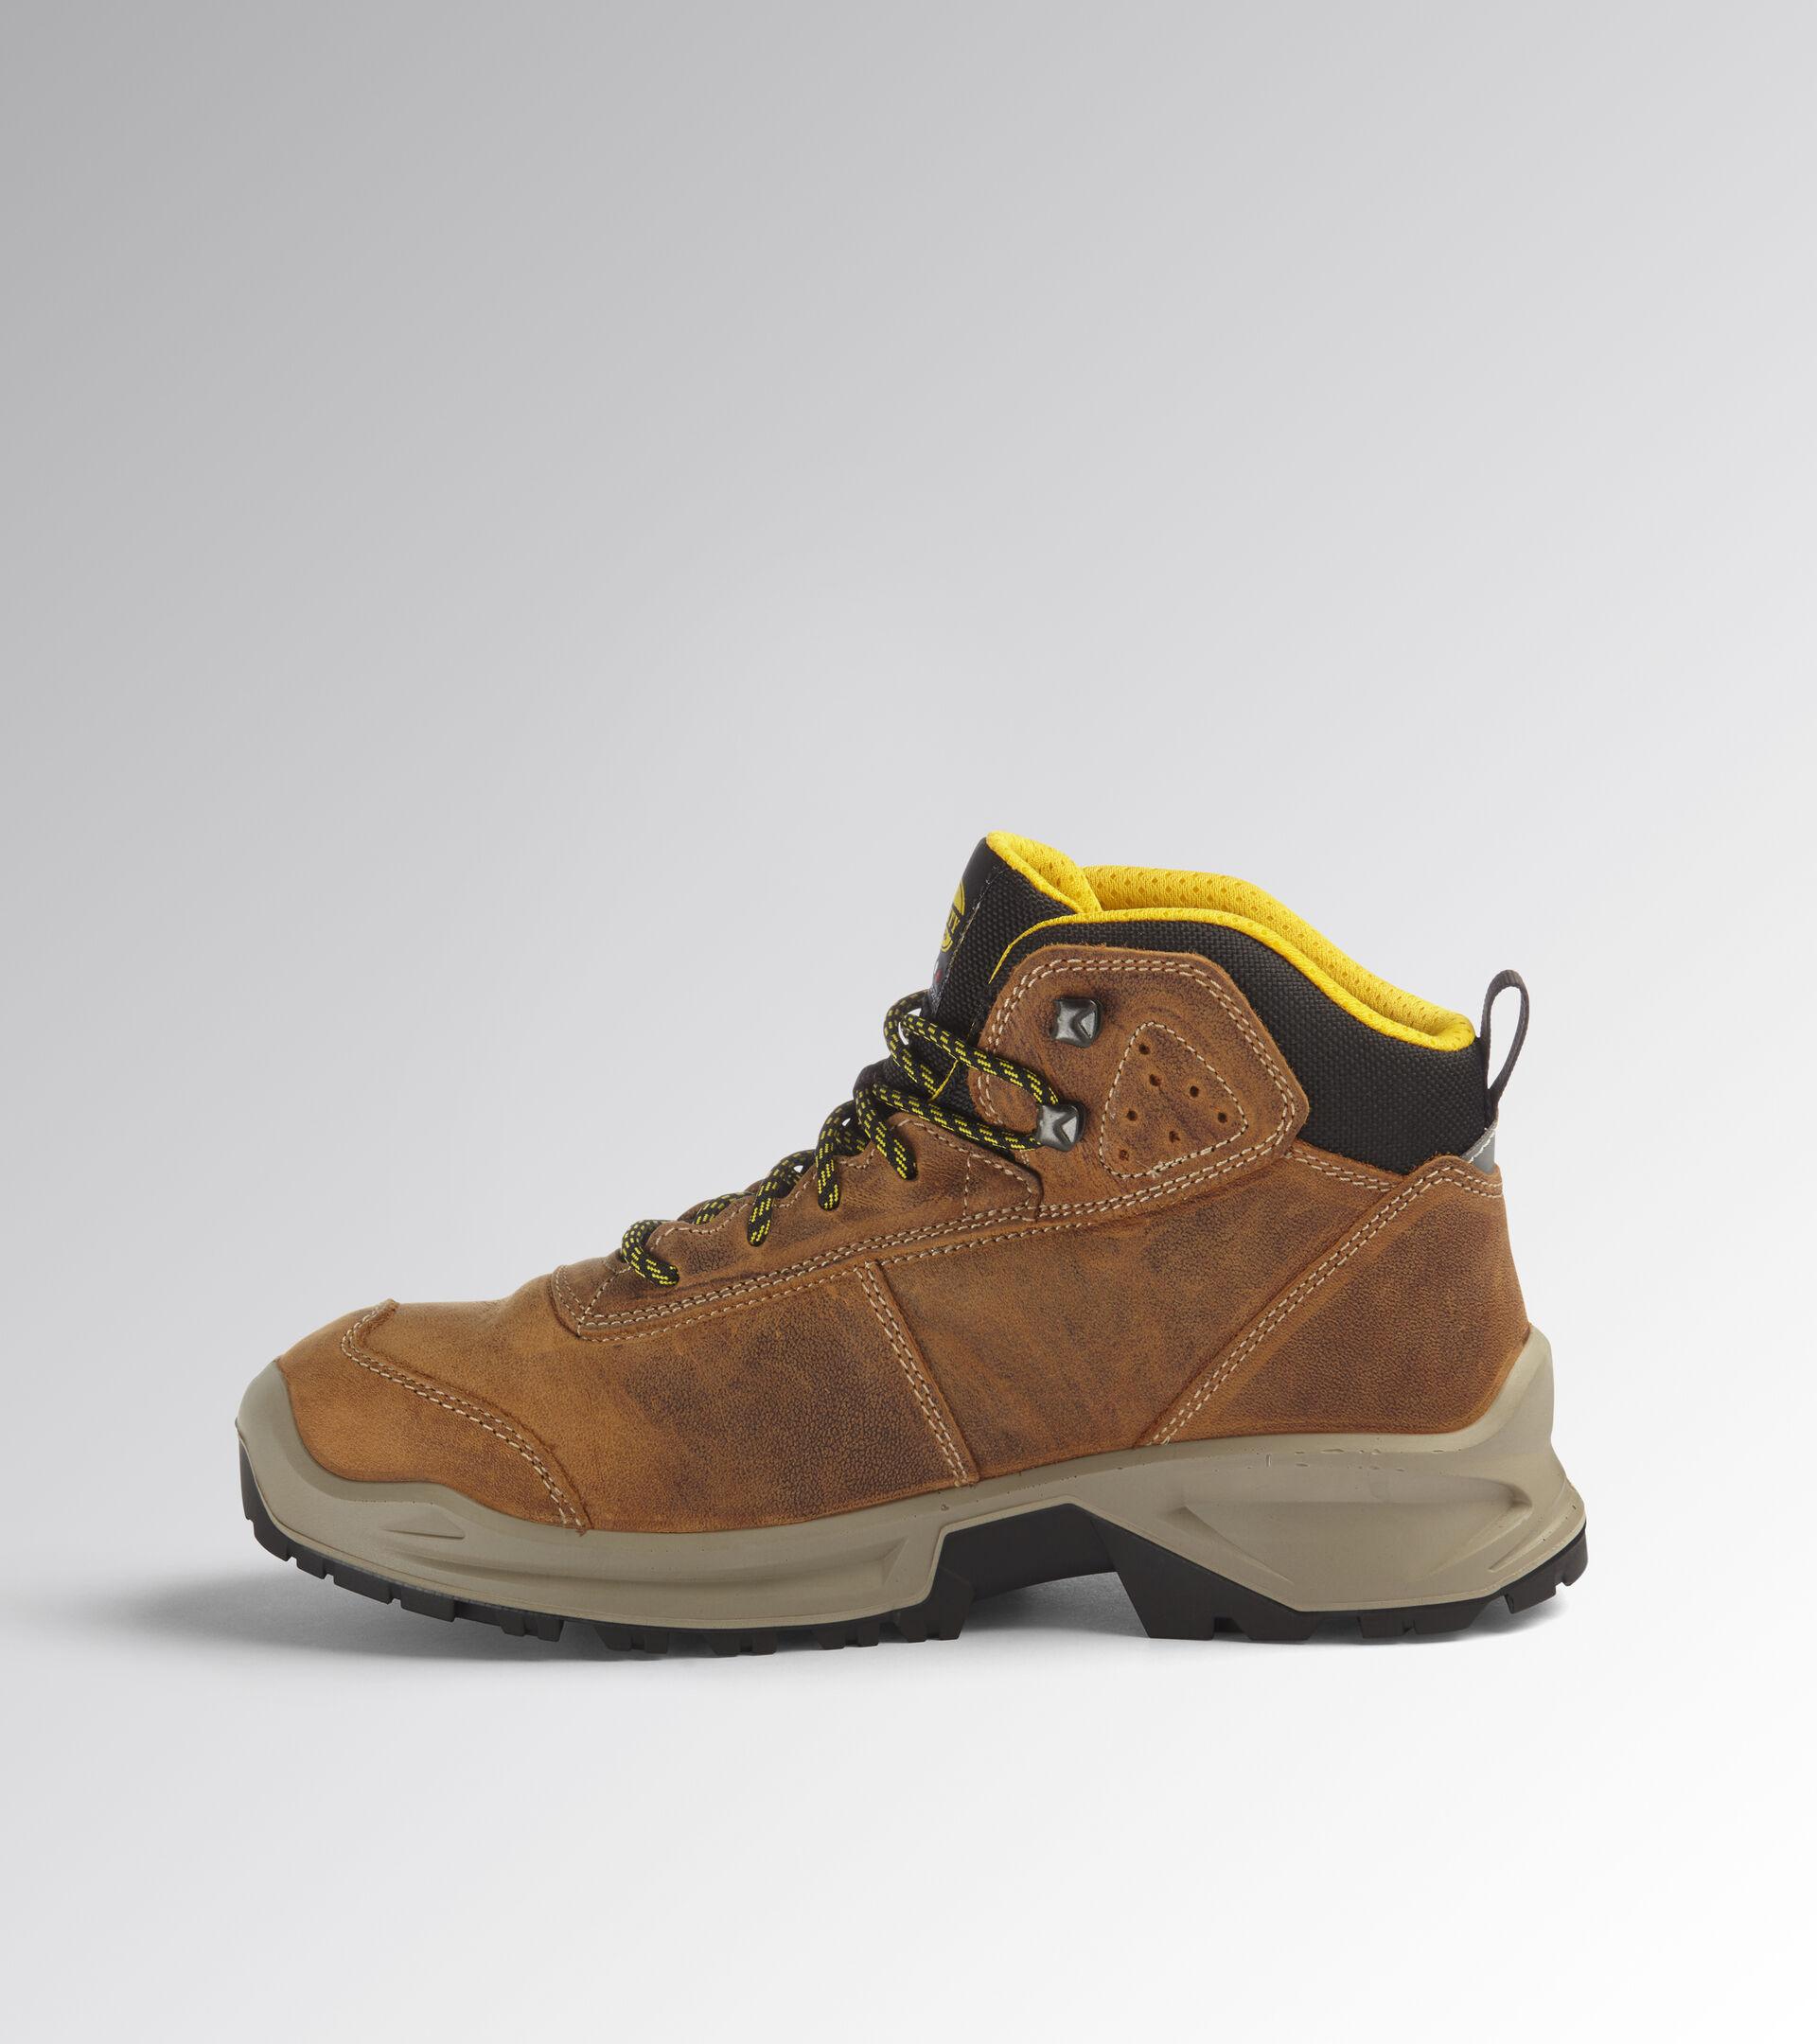 Footwear Utility UNISEX COUNTRY MID S3 SRC DARK BROWN (30050) Utility